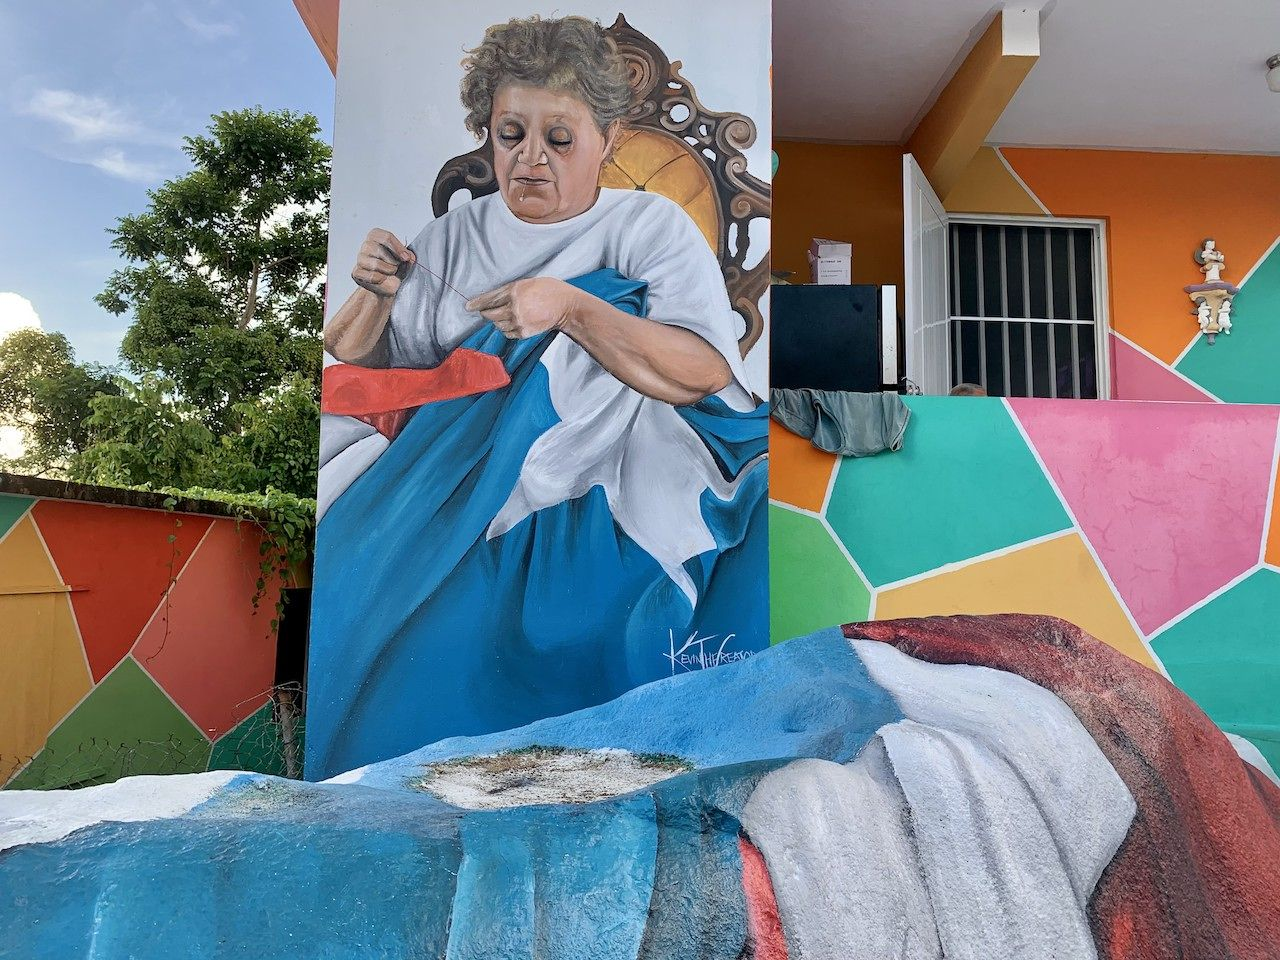 street art mural in Puerto Rico